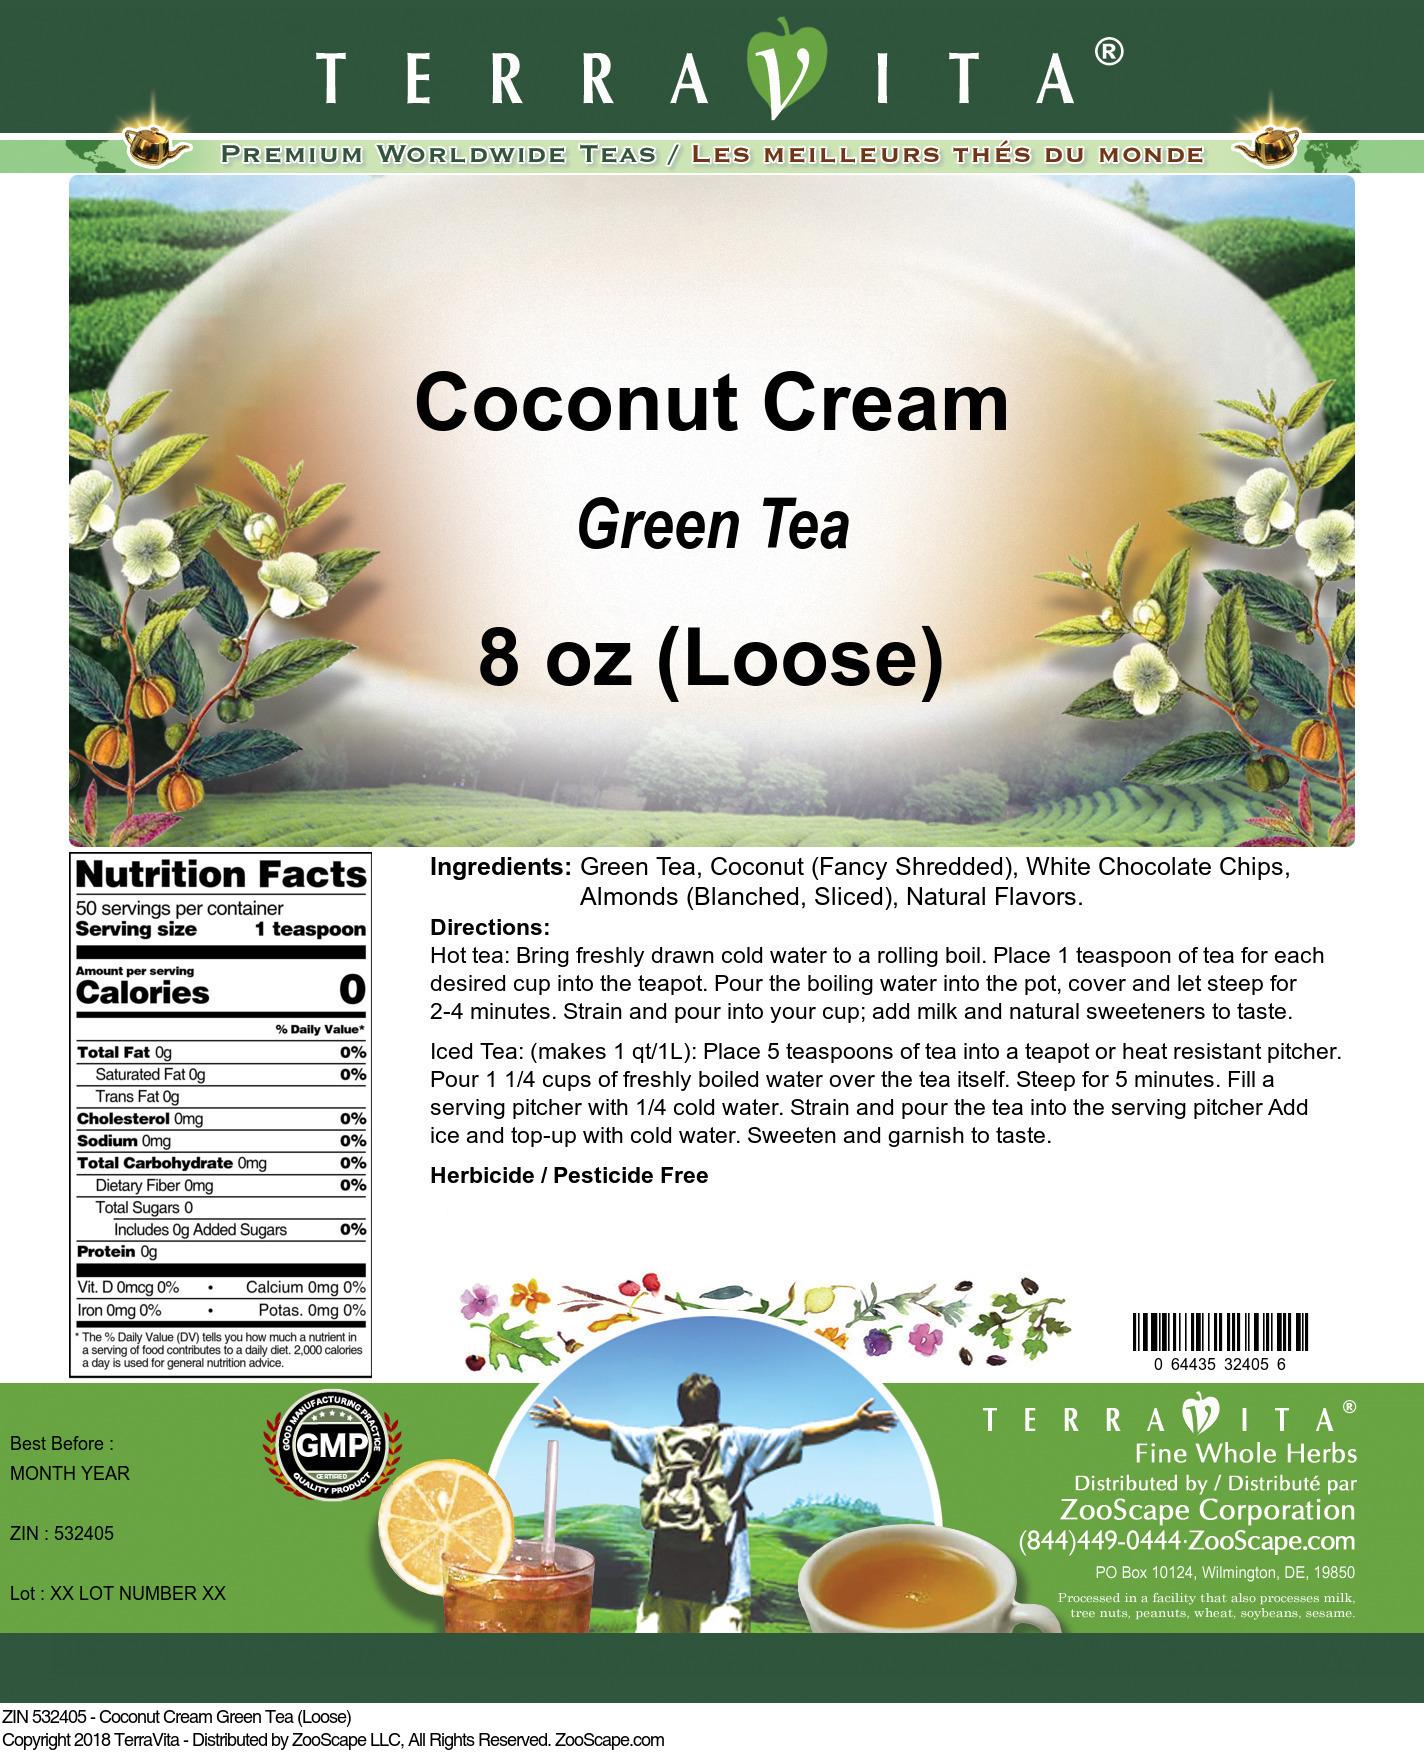 Coconut Cream Green Tea